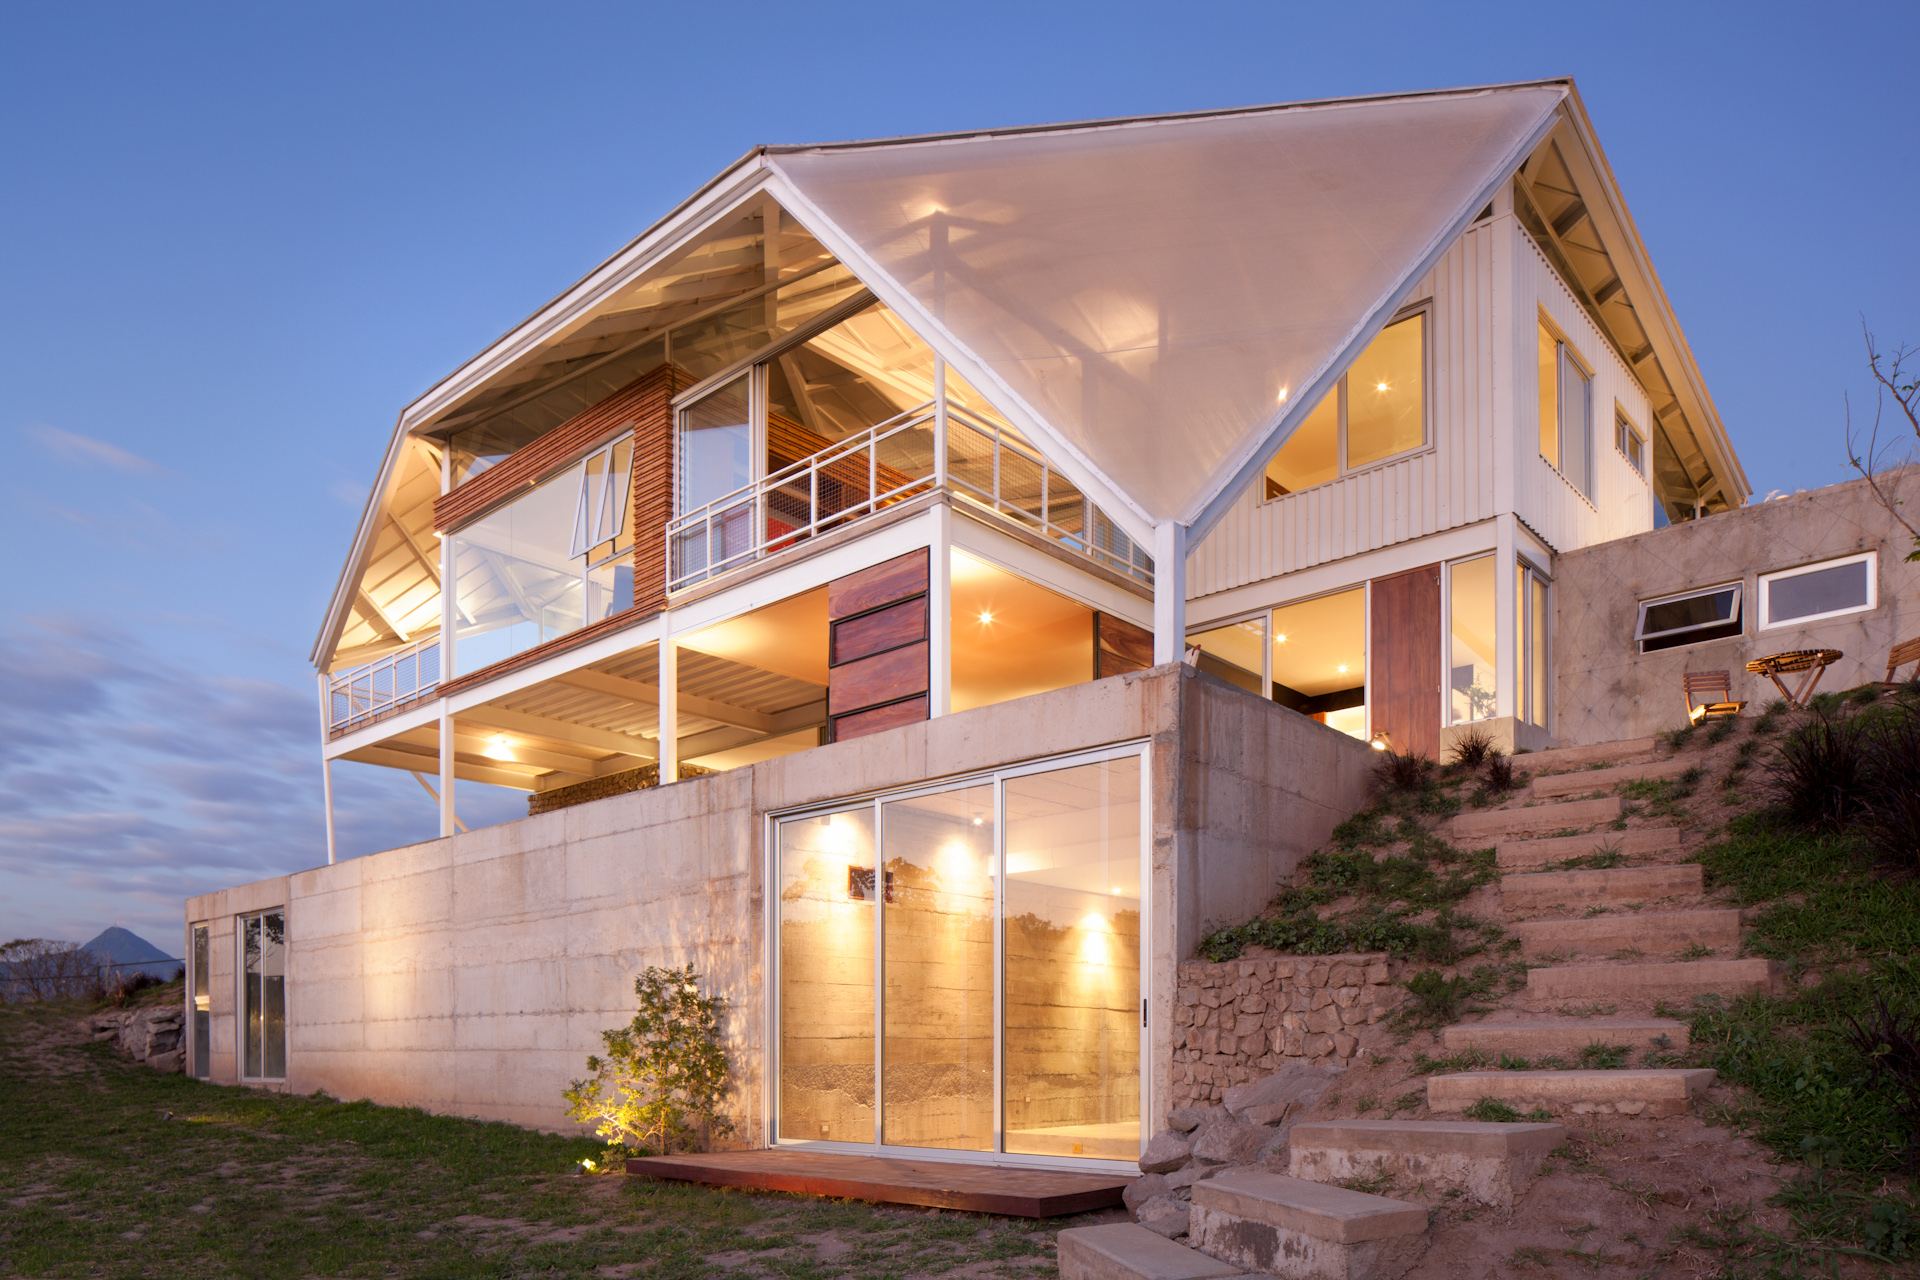 Architecture-Modern-La-Piscucha-El-Salvador-Dwell-Night-12.JPG